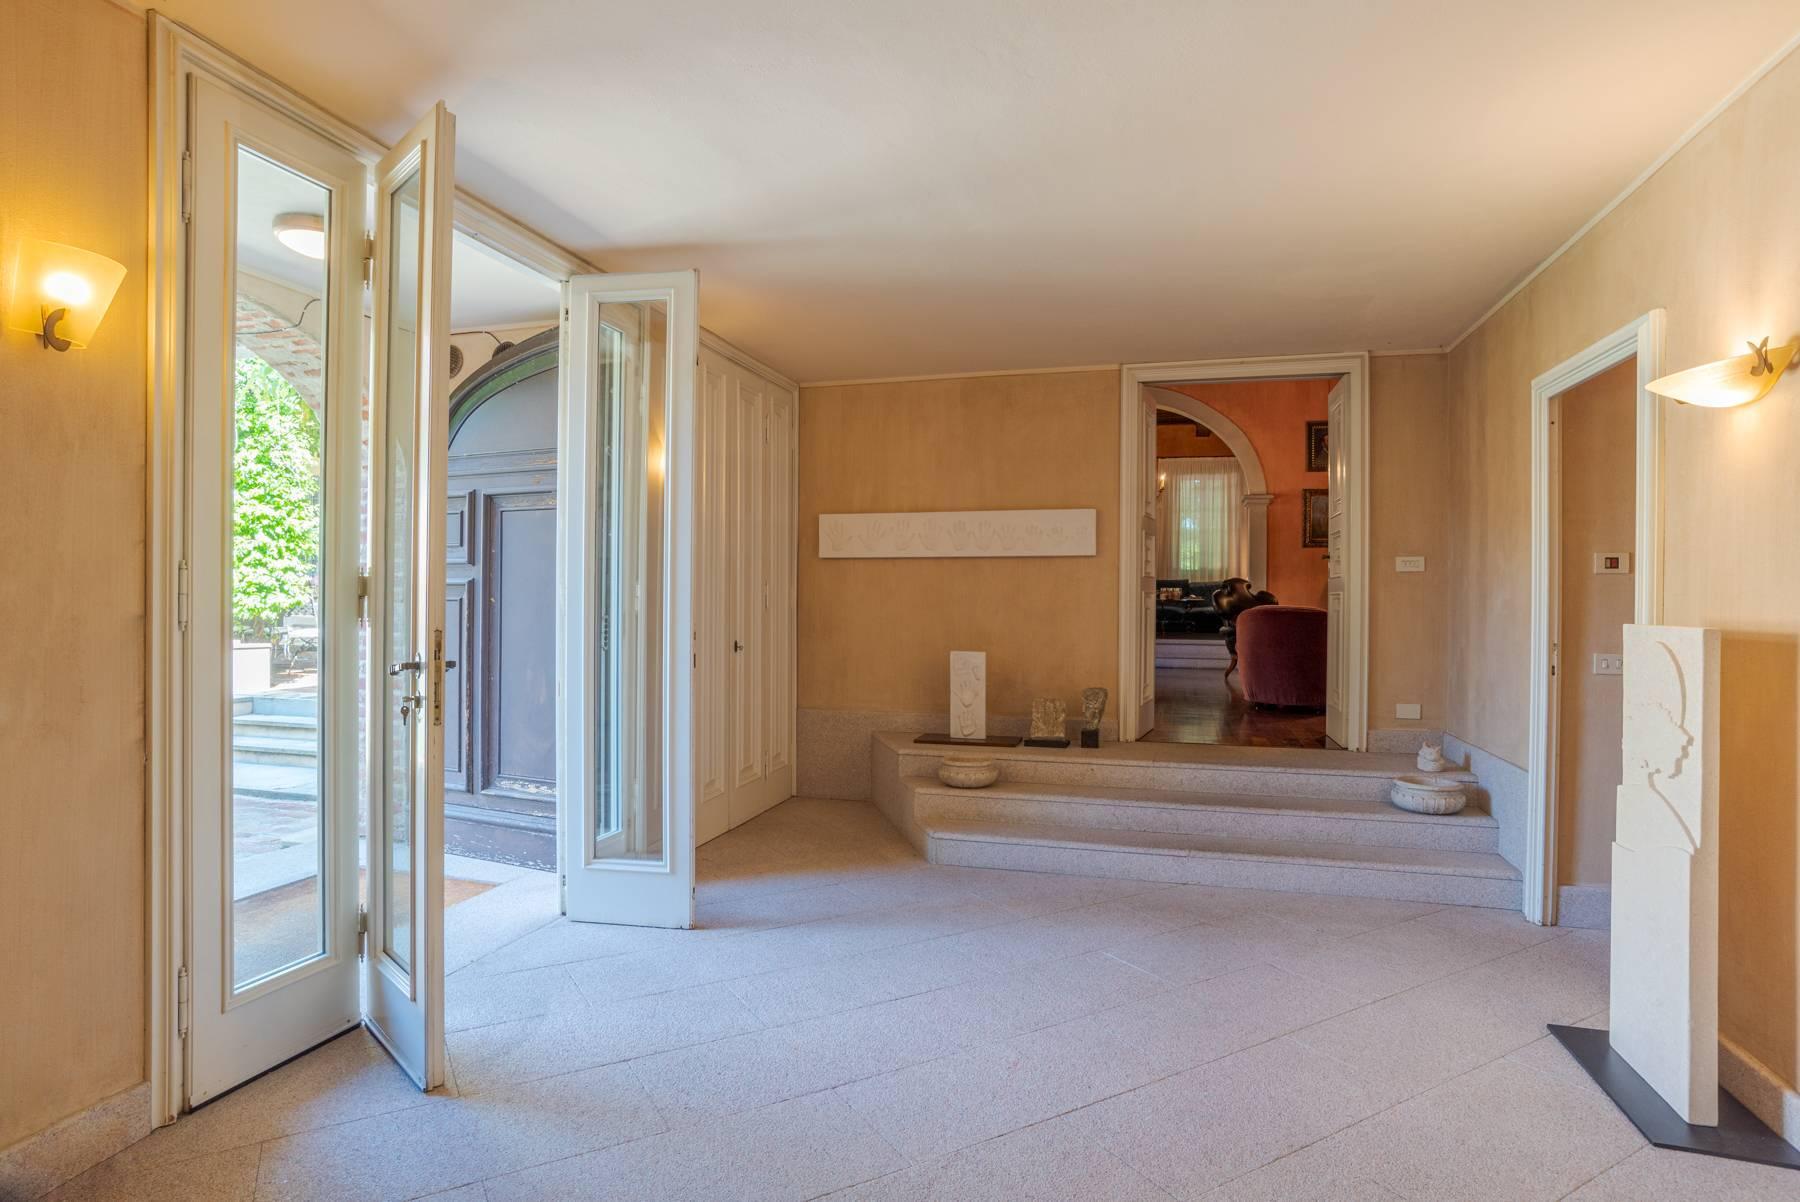 Magnifica proprietà immersa nel verde a Pavia - 4